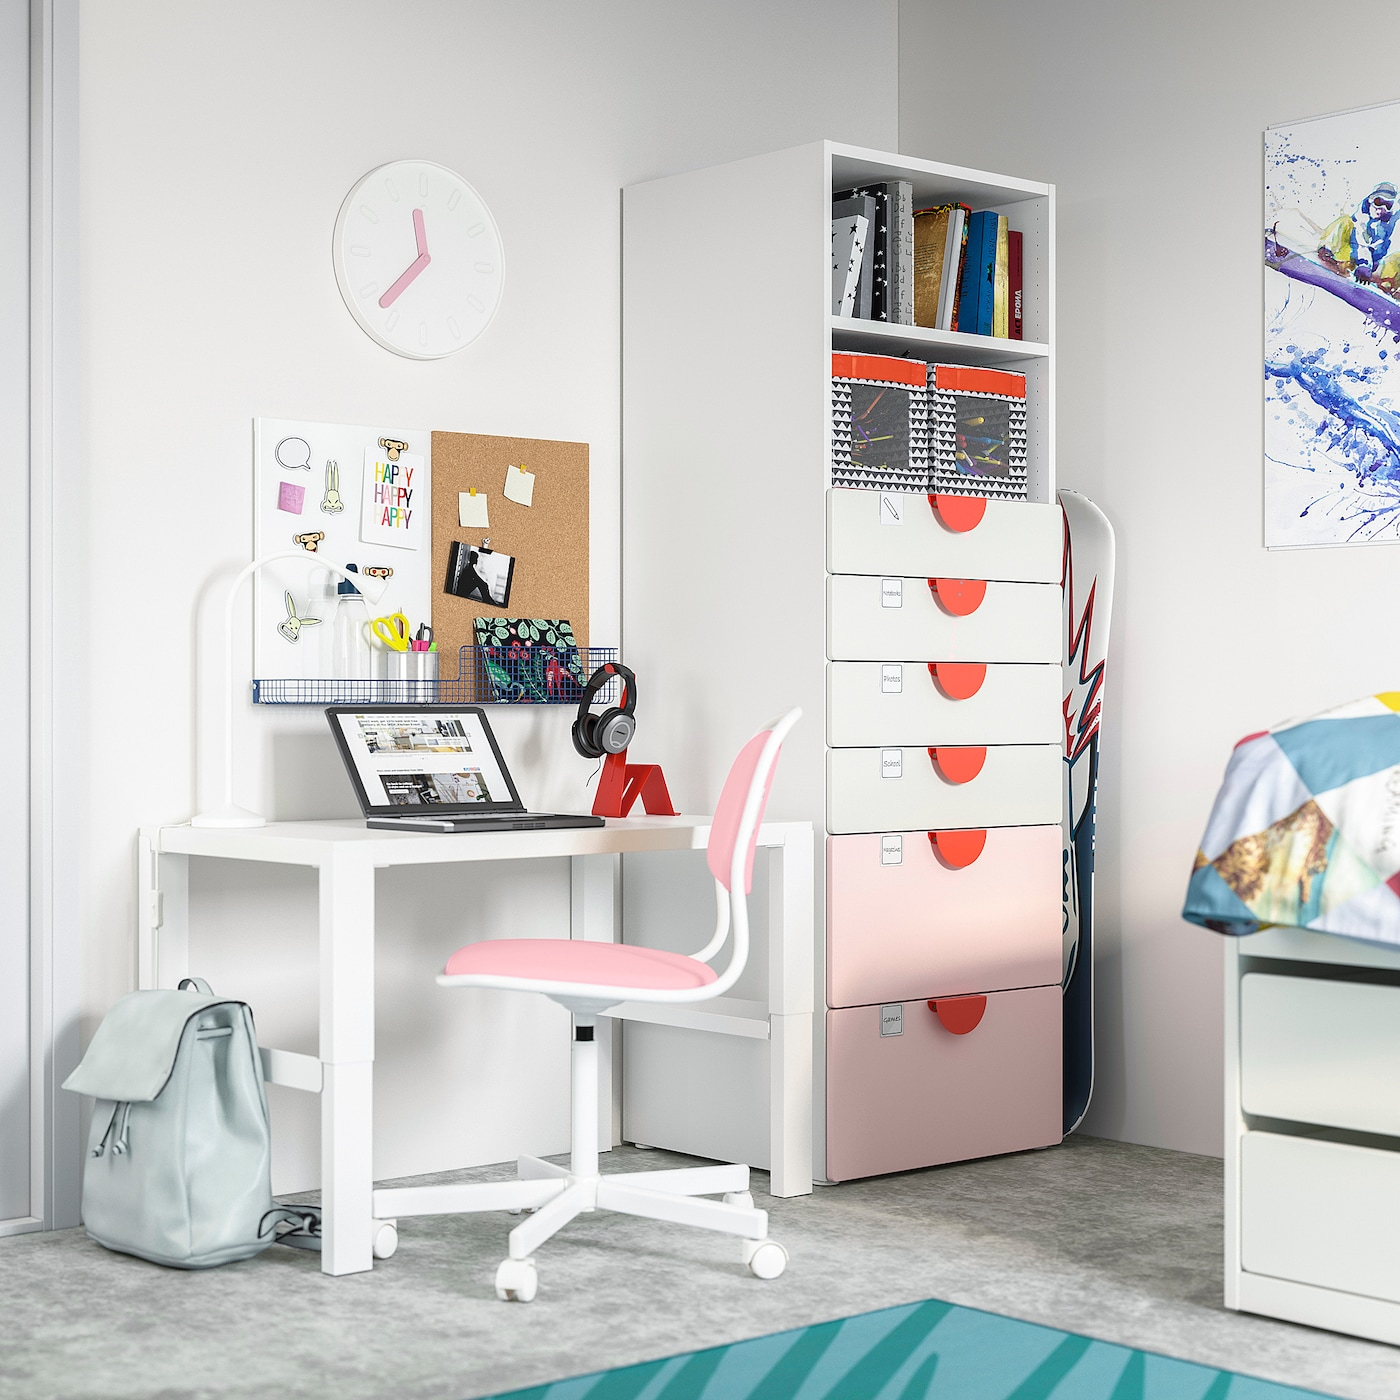 SMÅSTAD / PLATSA خزانة كتب, أبيض وردي فاتح/مع 6 أدراج, 60x57x181 سم